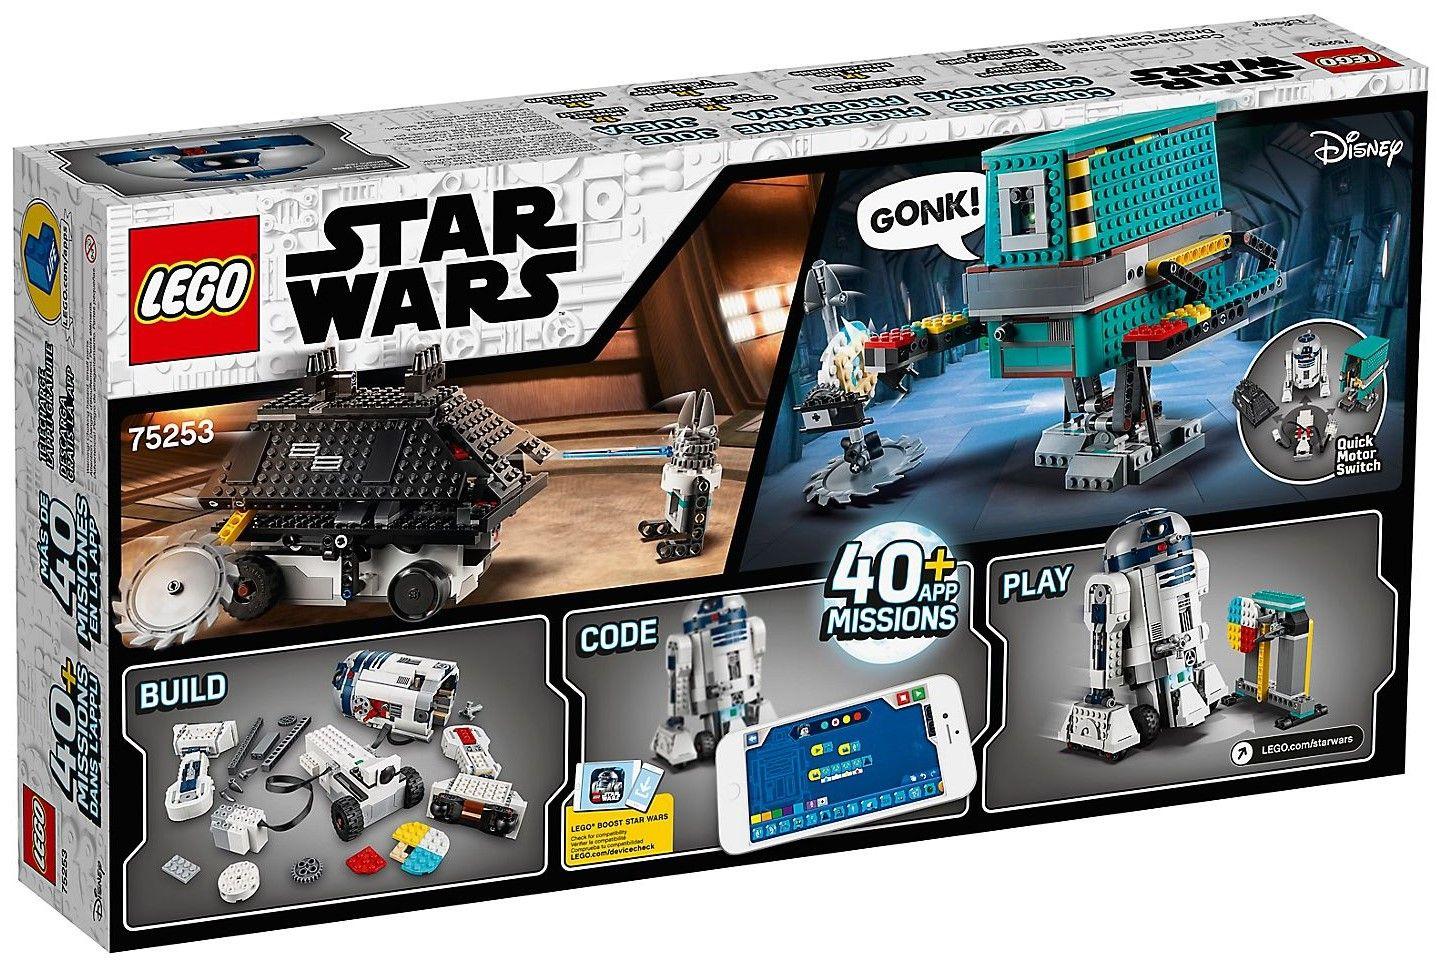 Конструктор Lego Star Wars - Droid Commander (75253) - 13